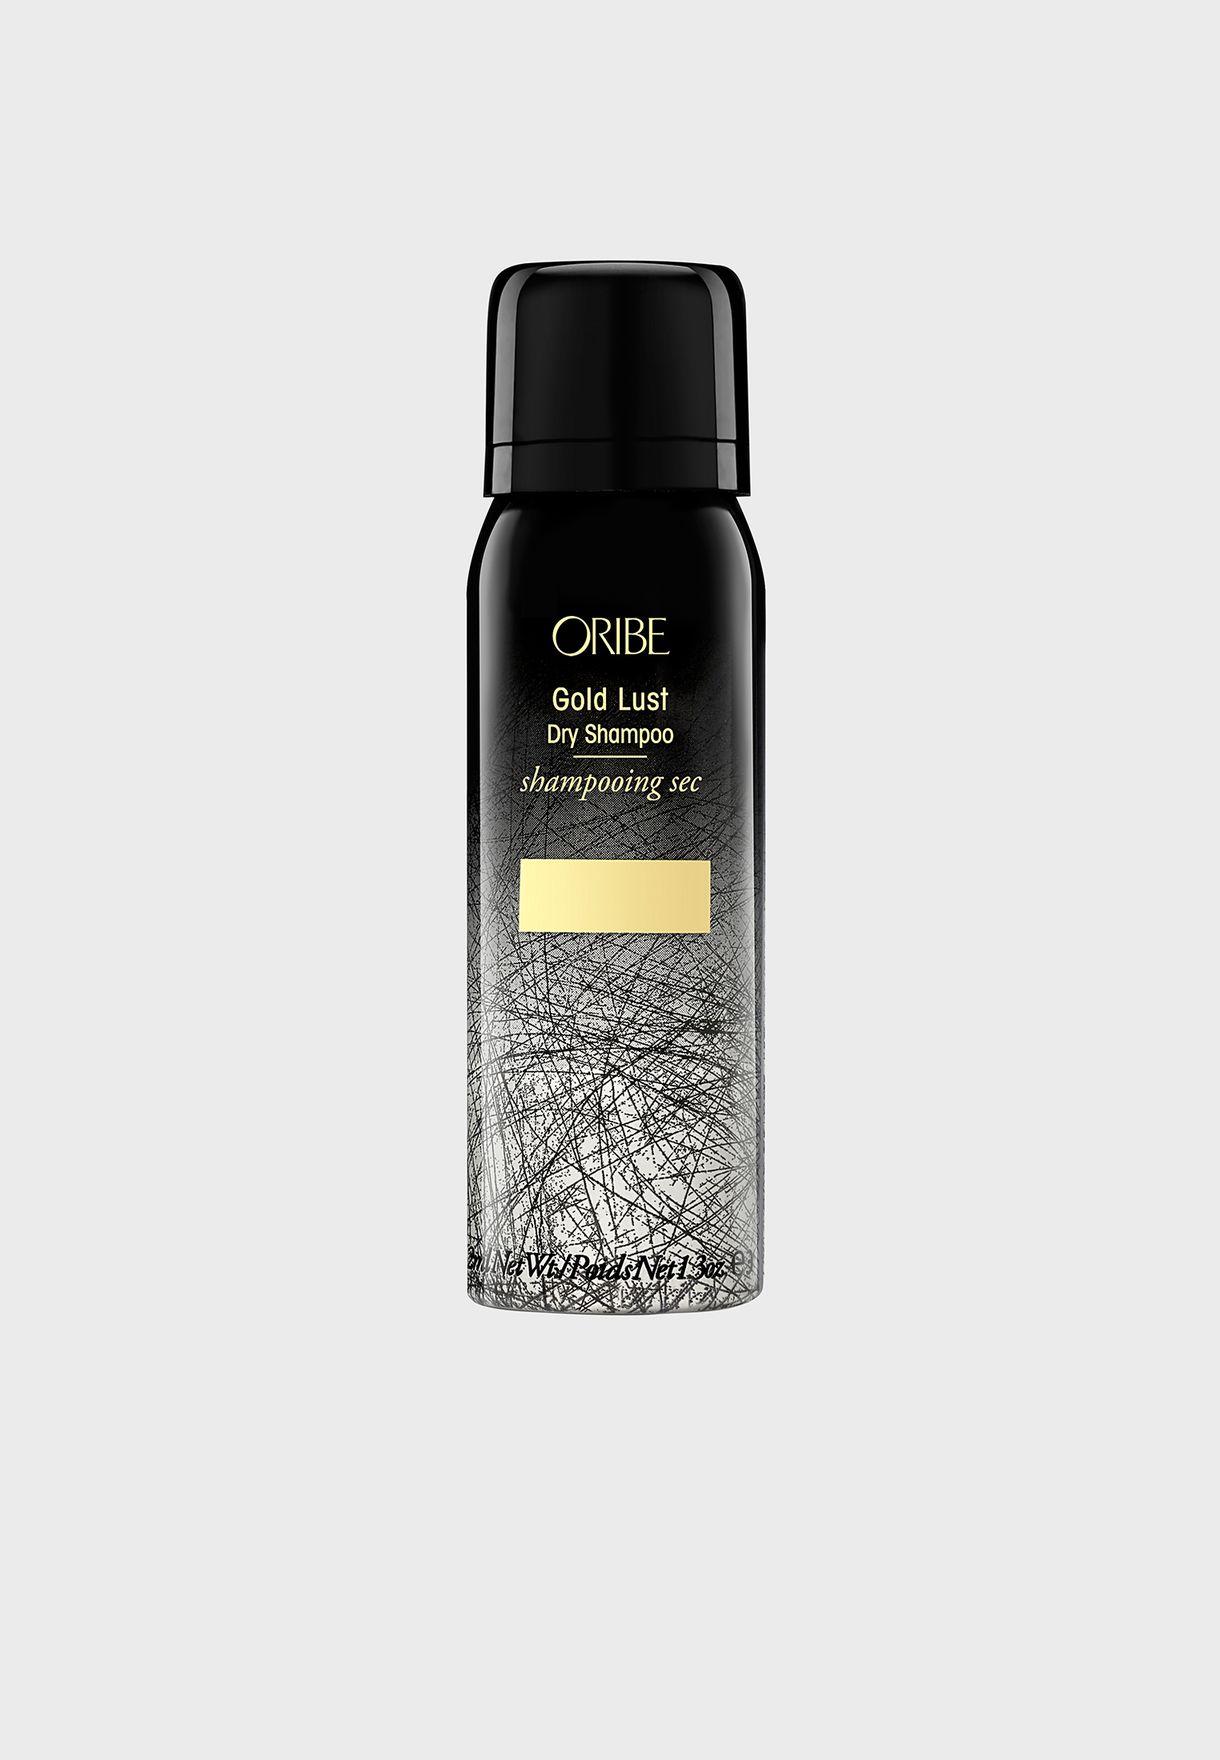 Gold Lust Dry Shampoo Travel Size